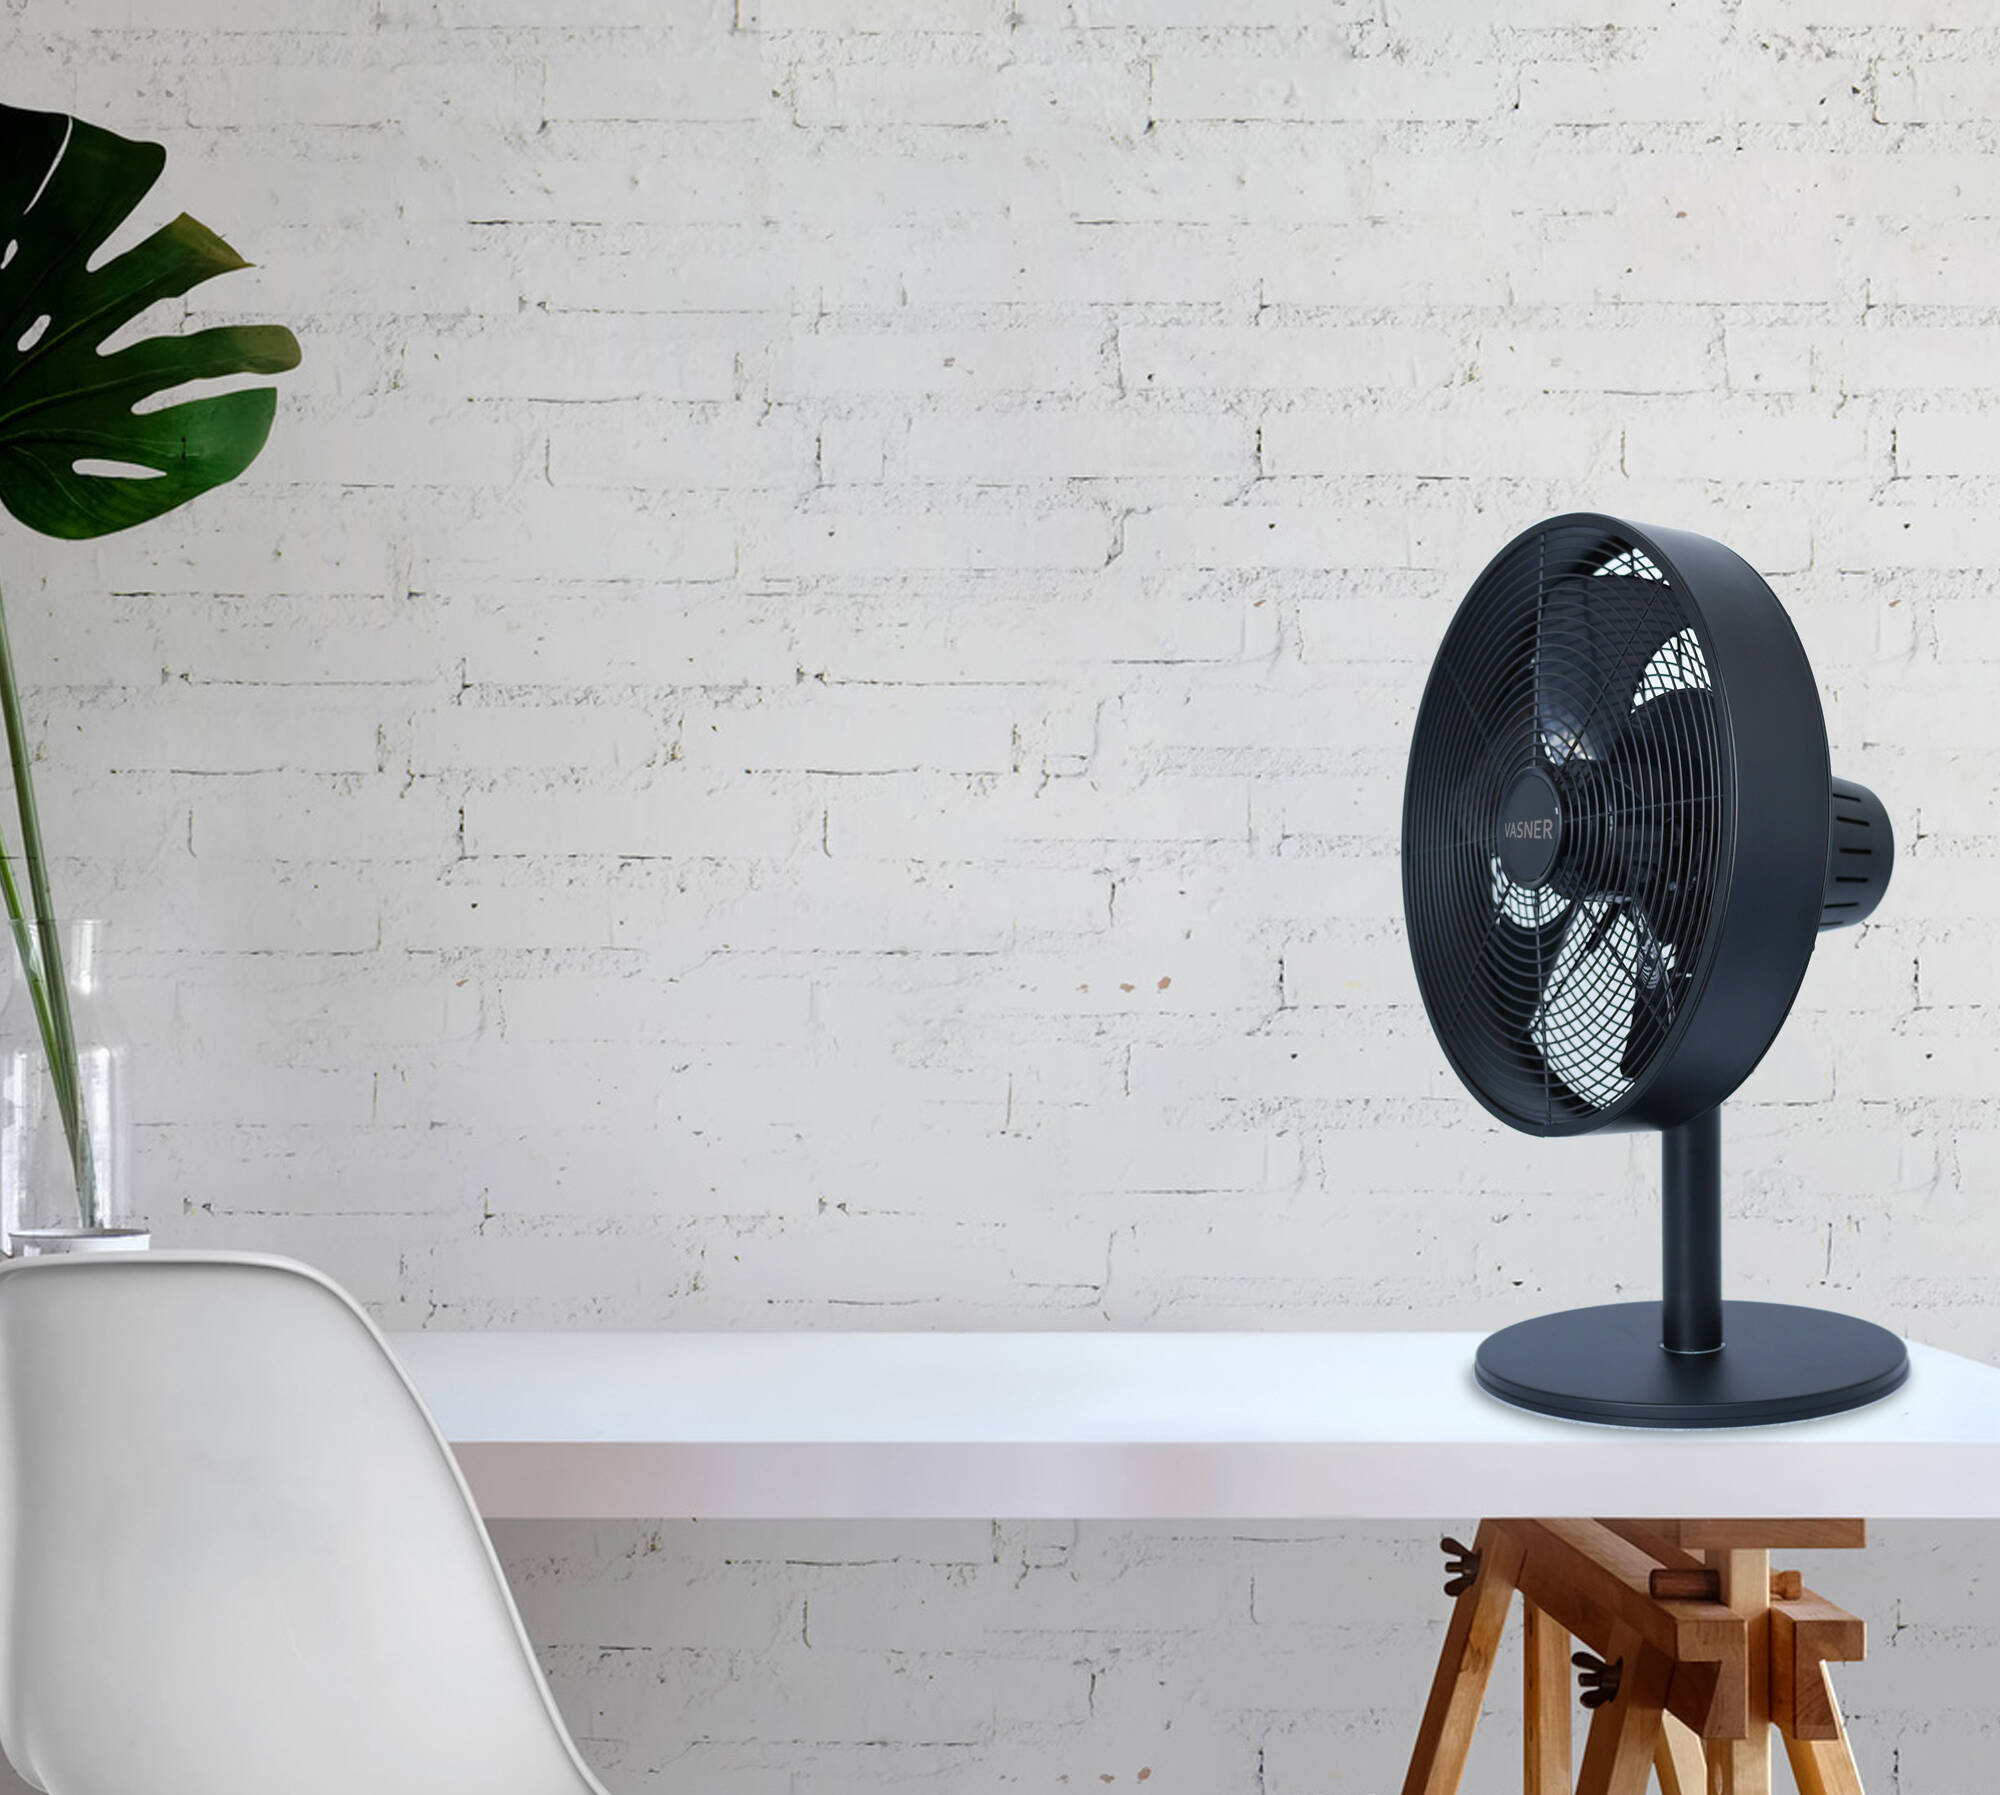 Ventilator Arbeitsplatz zu heiß